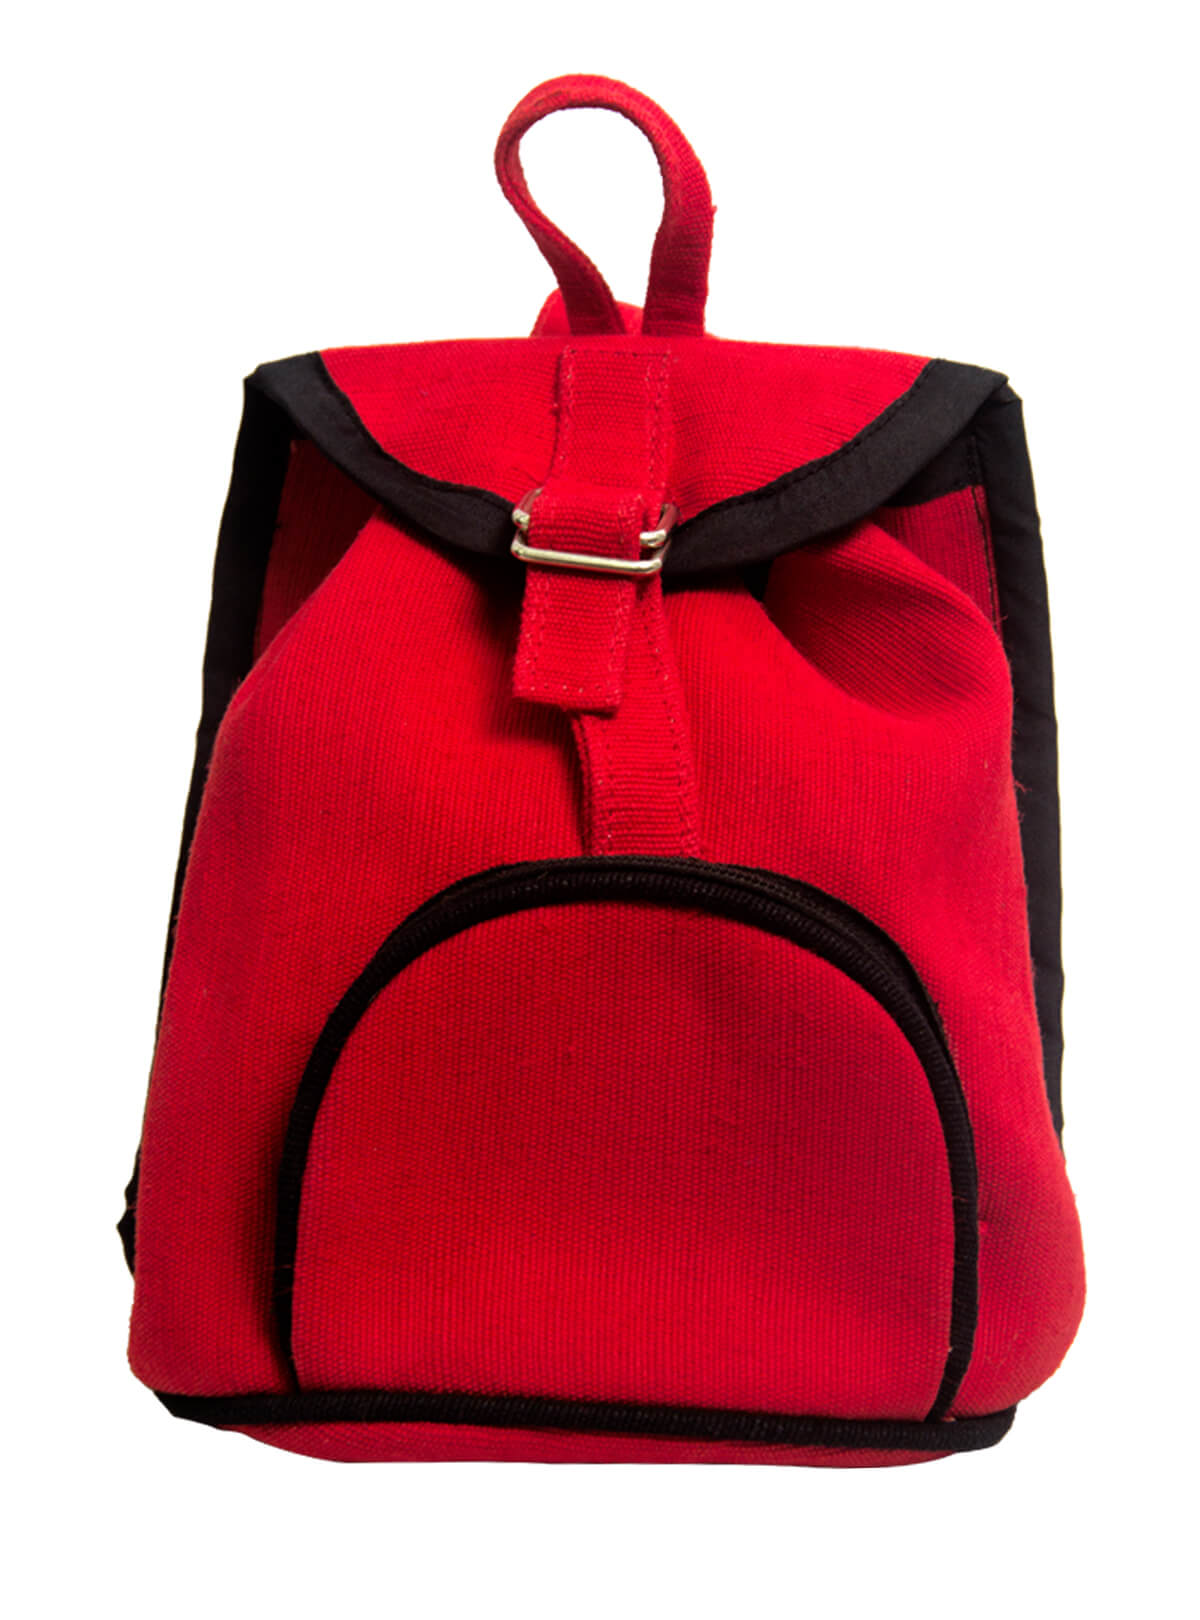 Carmine Red Baby Bag